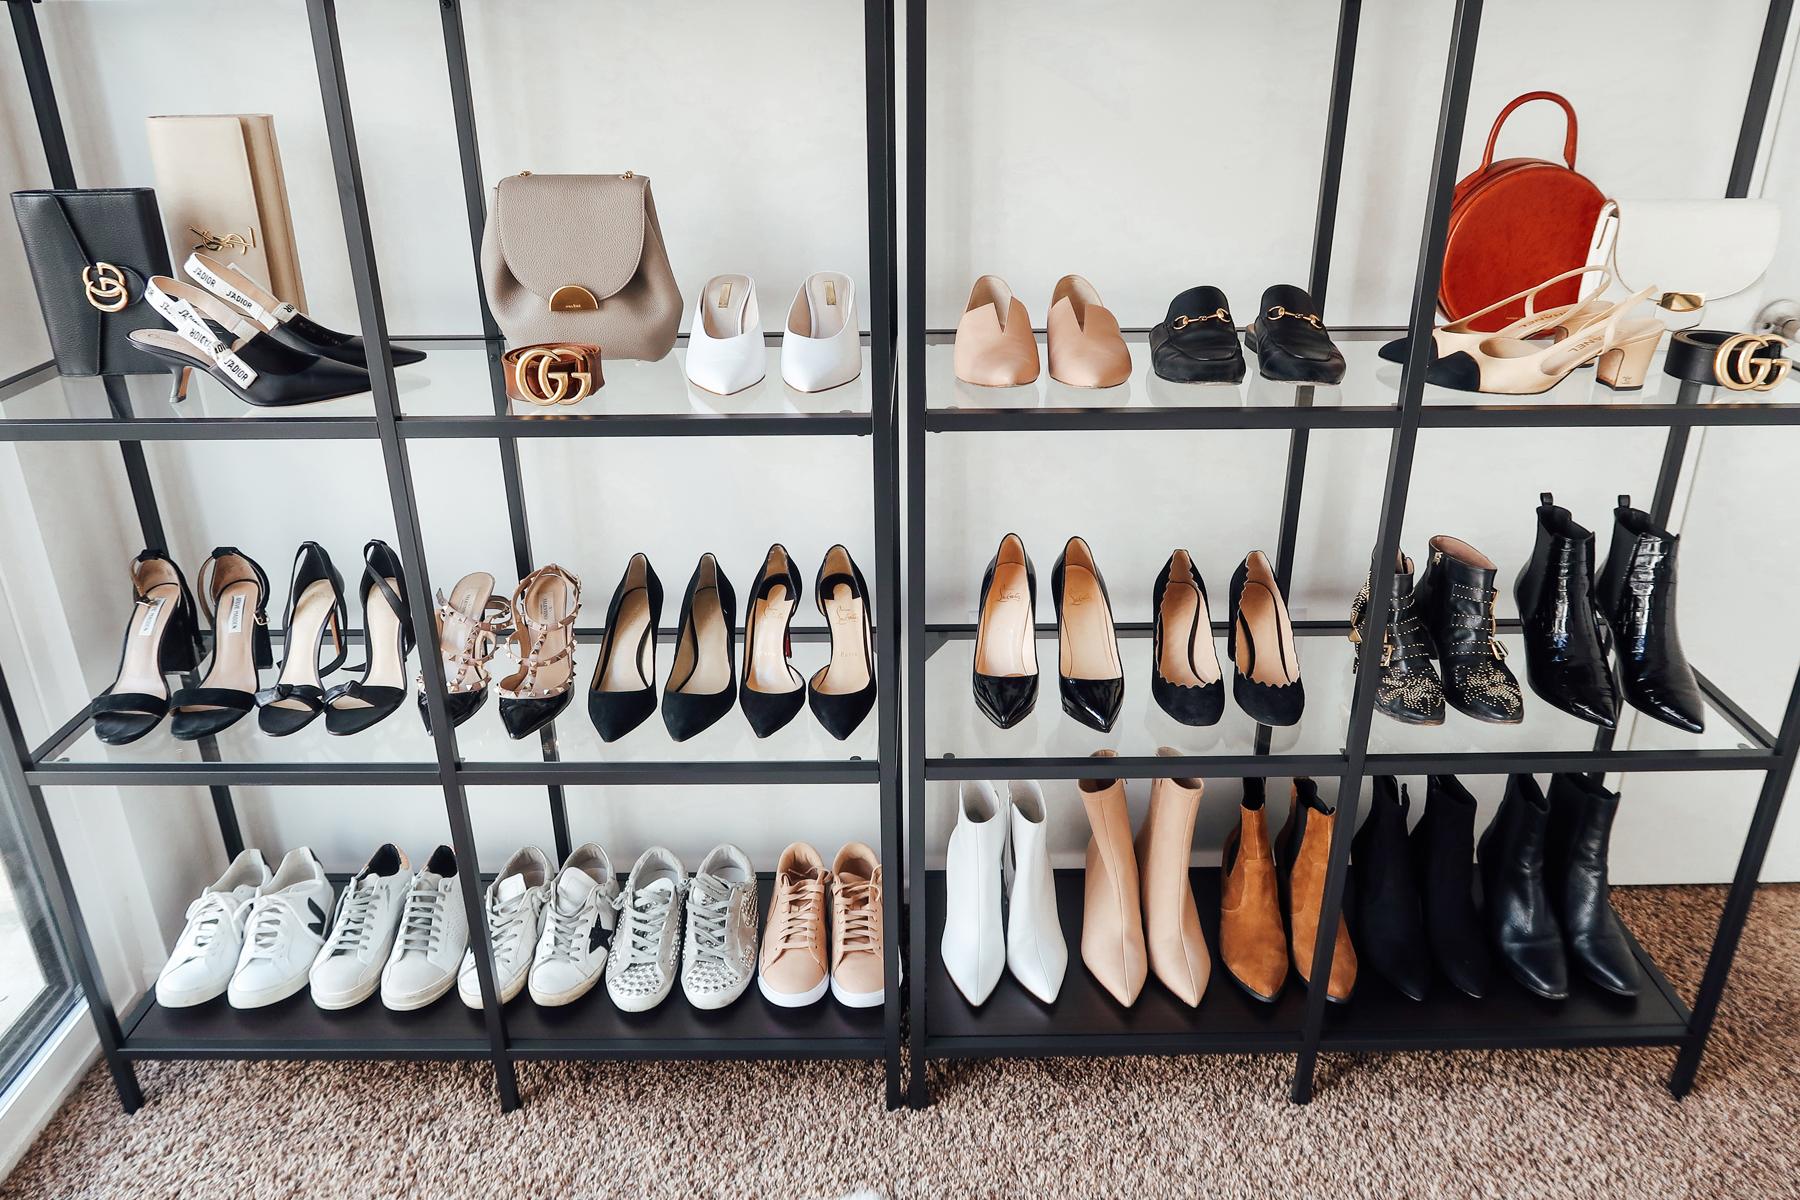 Fashion Jackson Handbag Shoe Collection Closet Office Shelf Storage